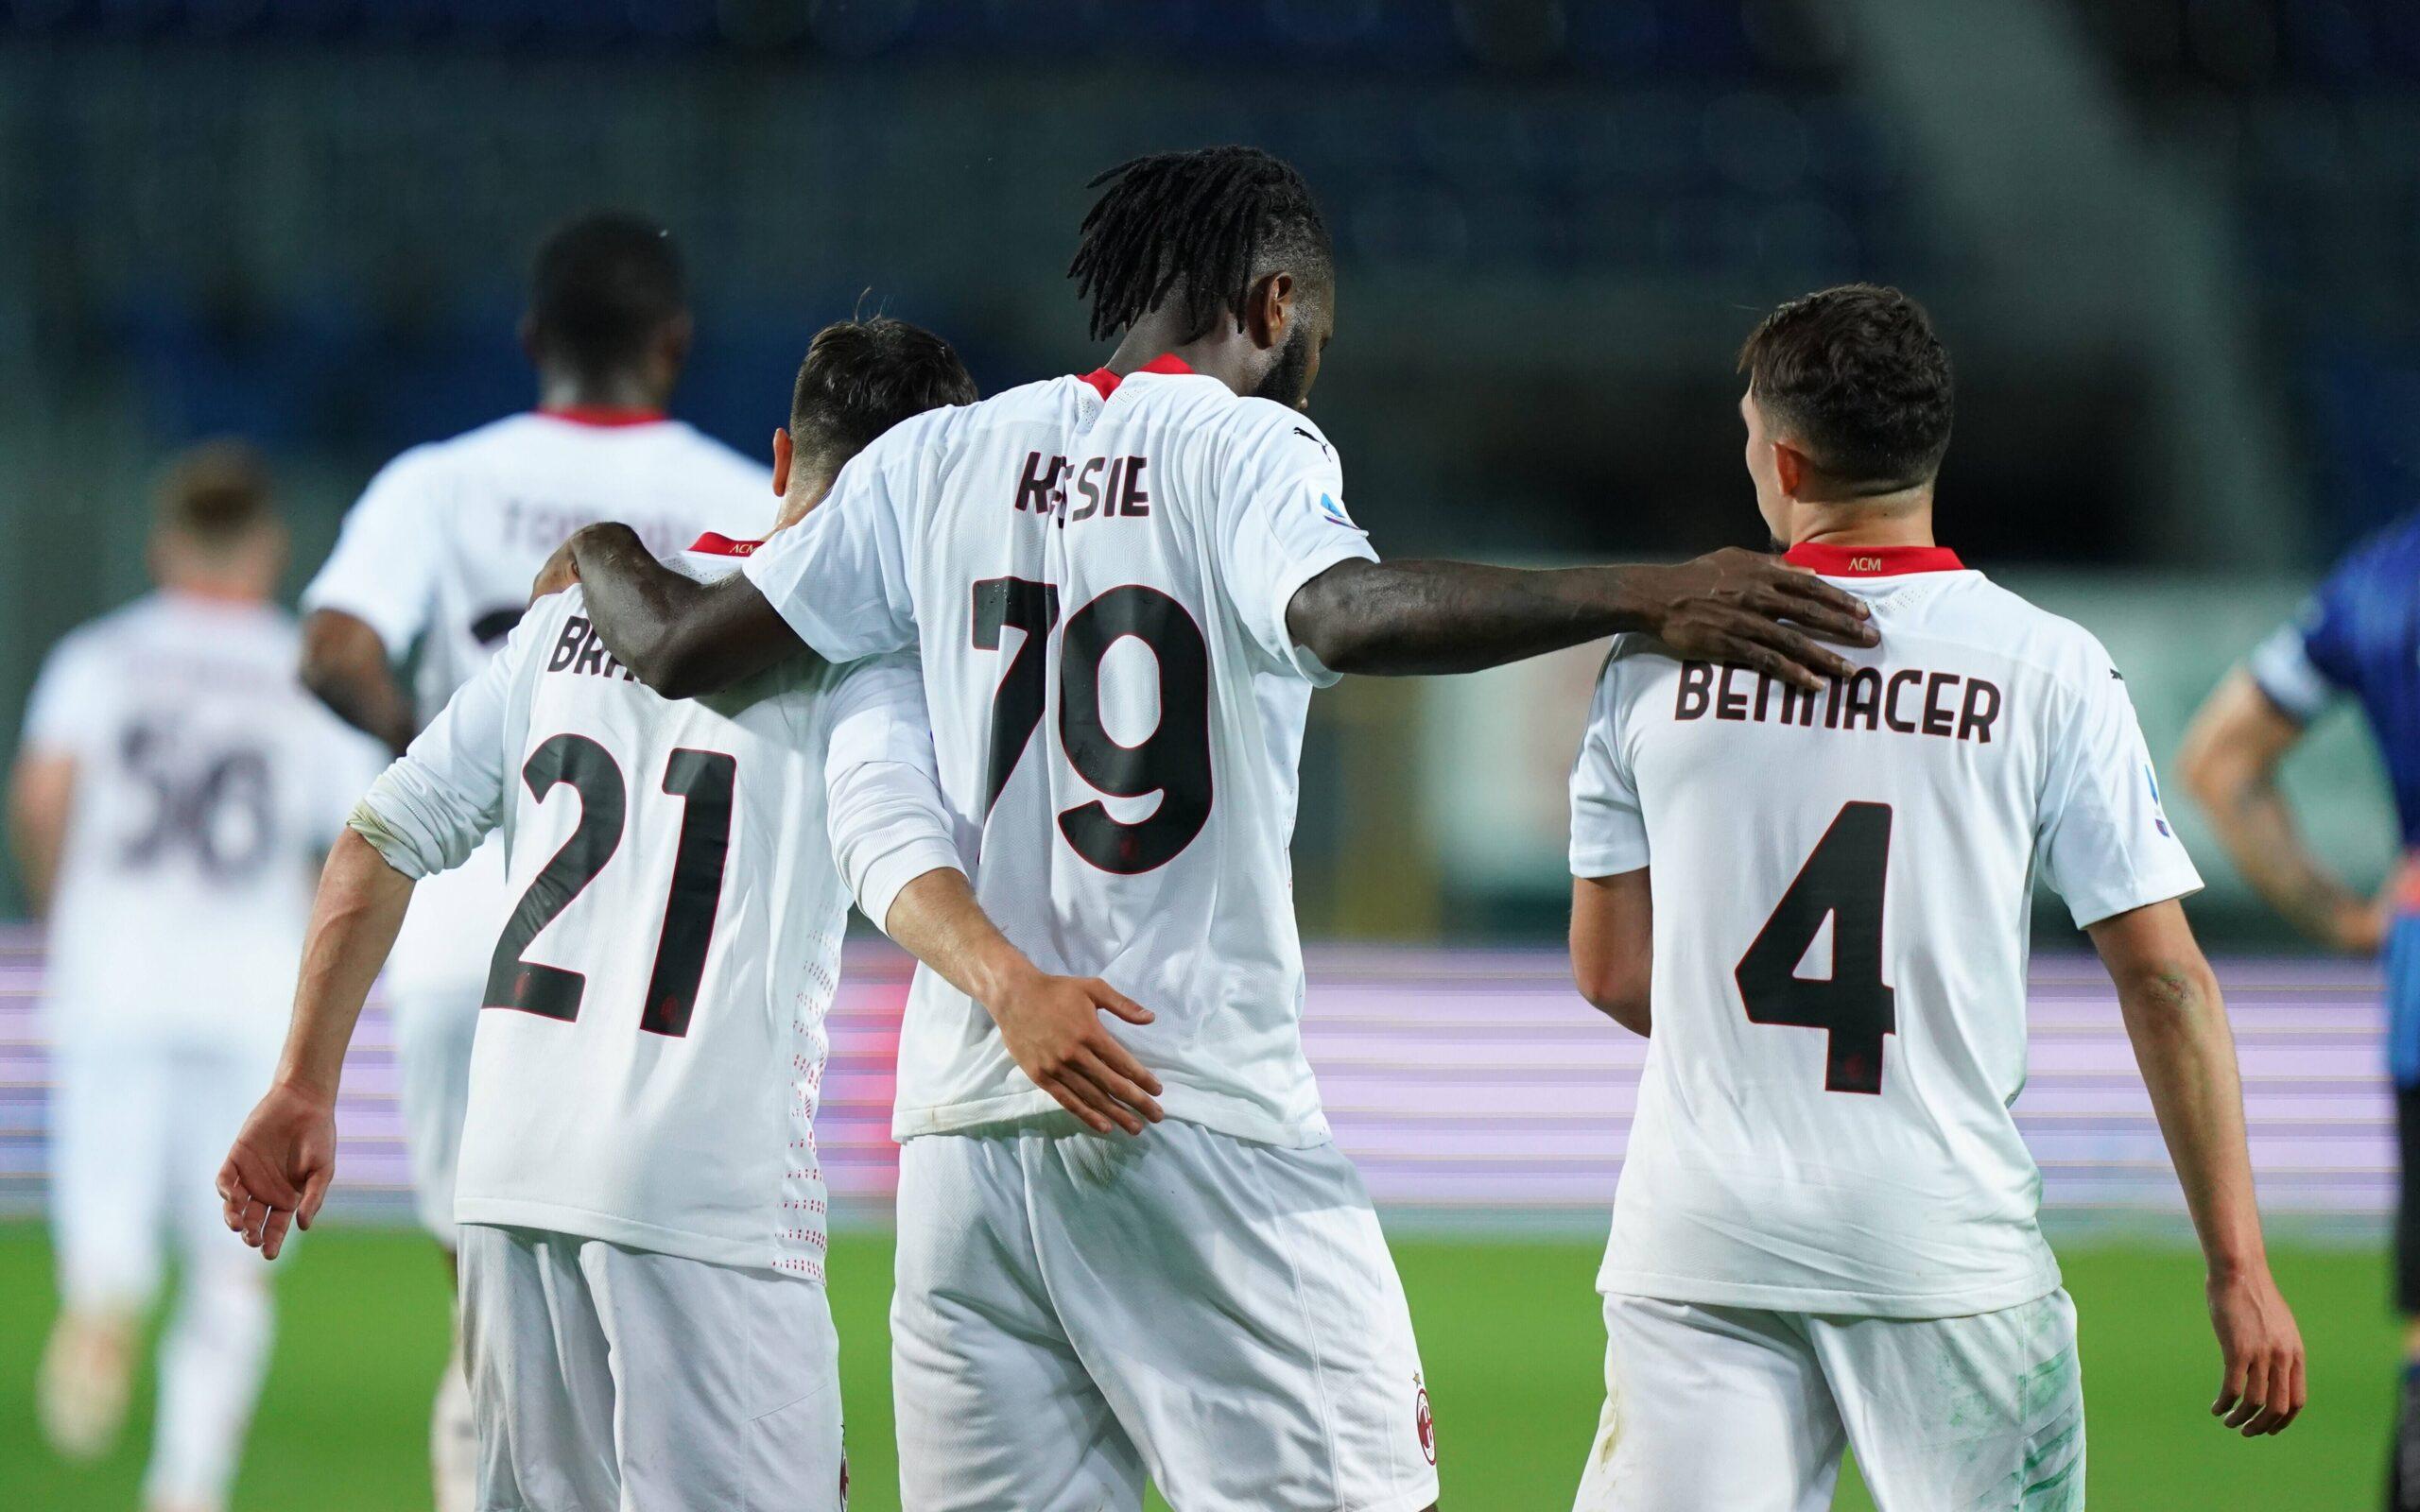 Calciomercato Milan, Atangana offre Kessié all'Inter